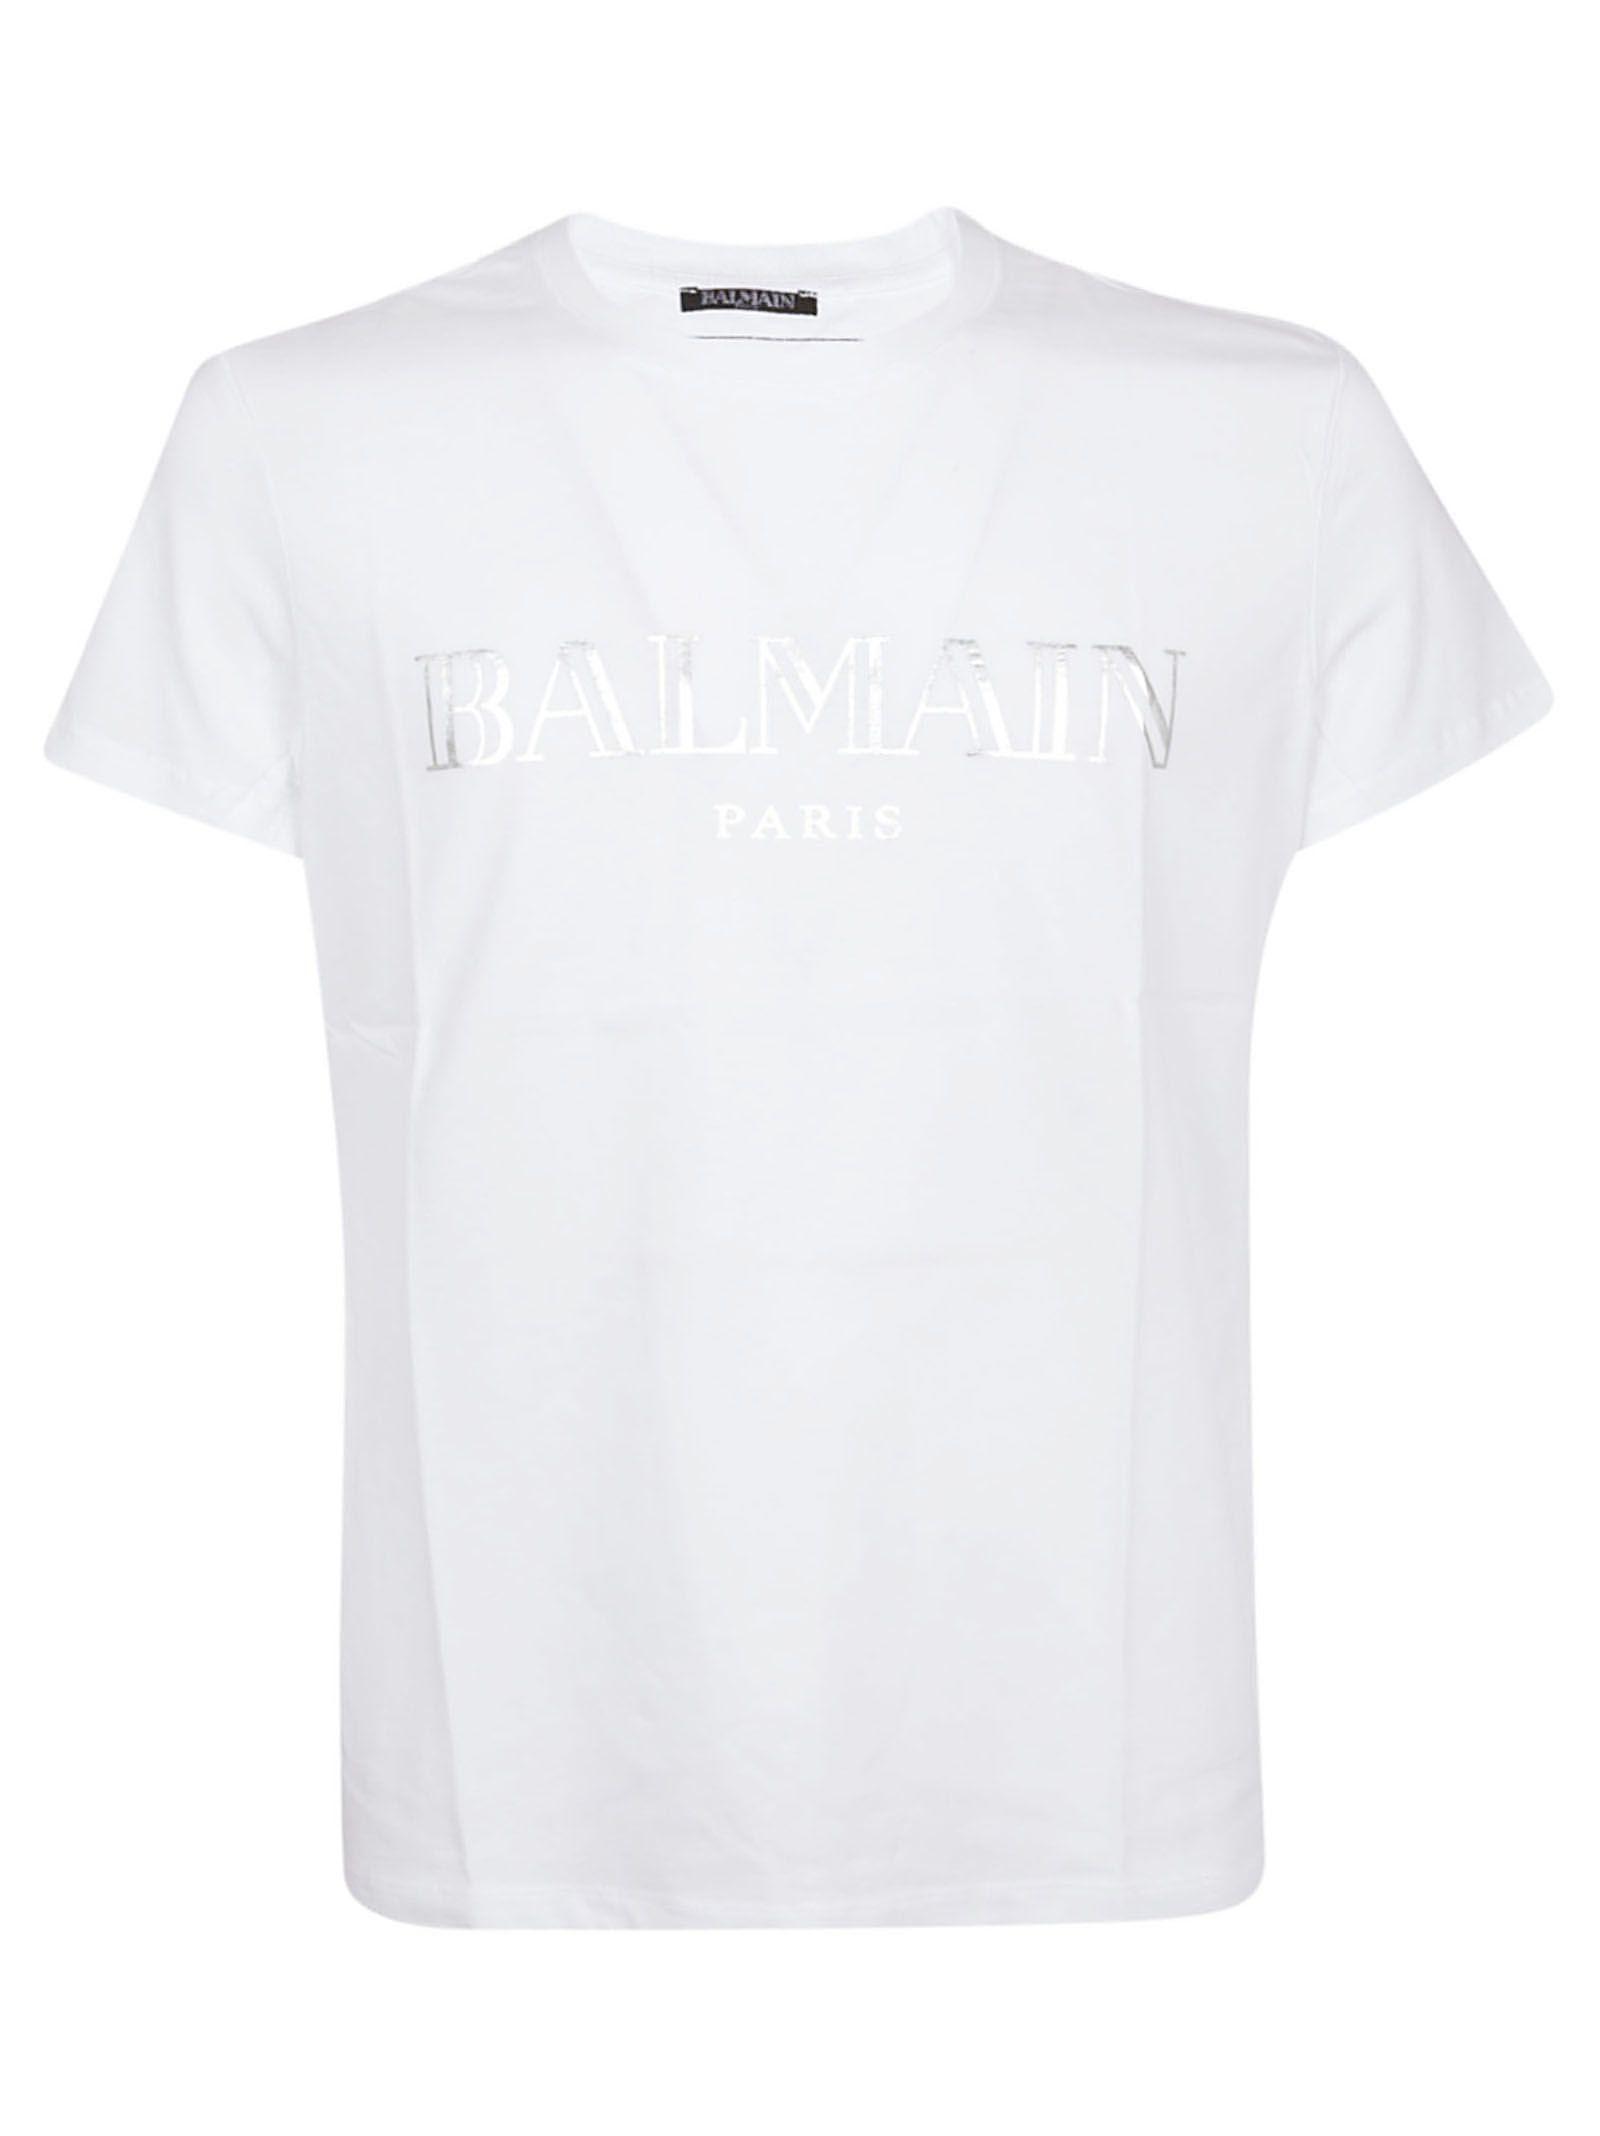 39e3b3a70e66e4 BALMAIN LOGO PRINT T-SHIRT. #balmain #cloth | Balmain in 2019 ...